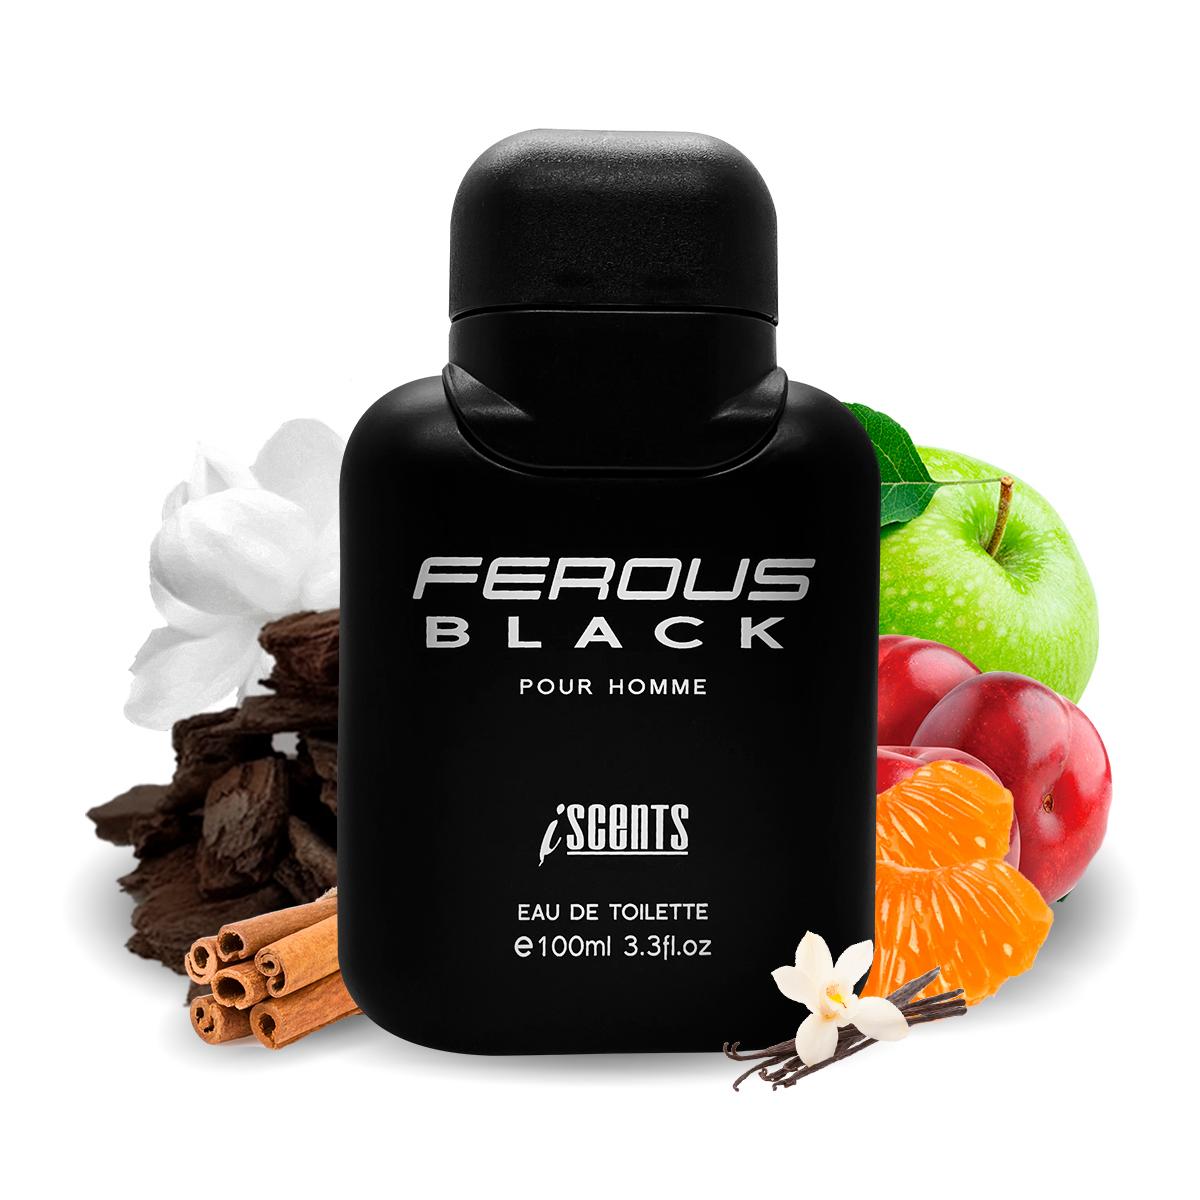 Kit 2 Perfumes Importados Buzz e Ferous Black I Scents